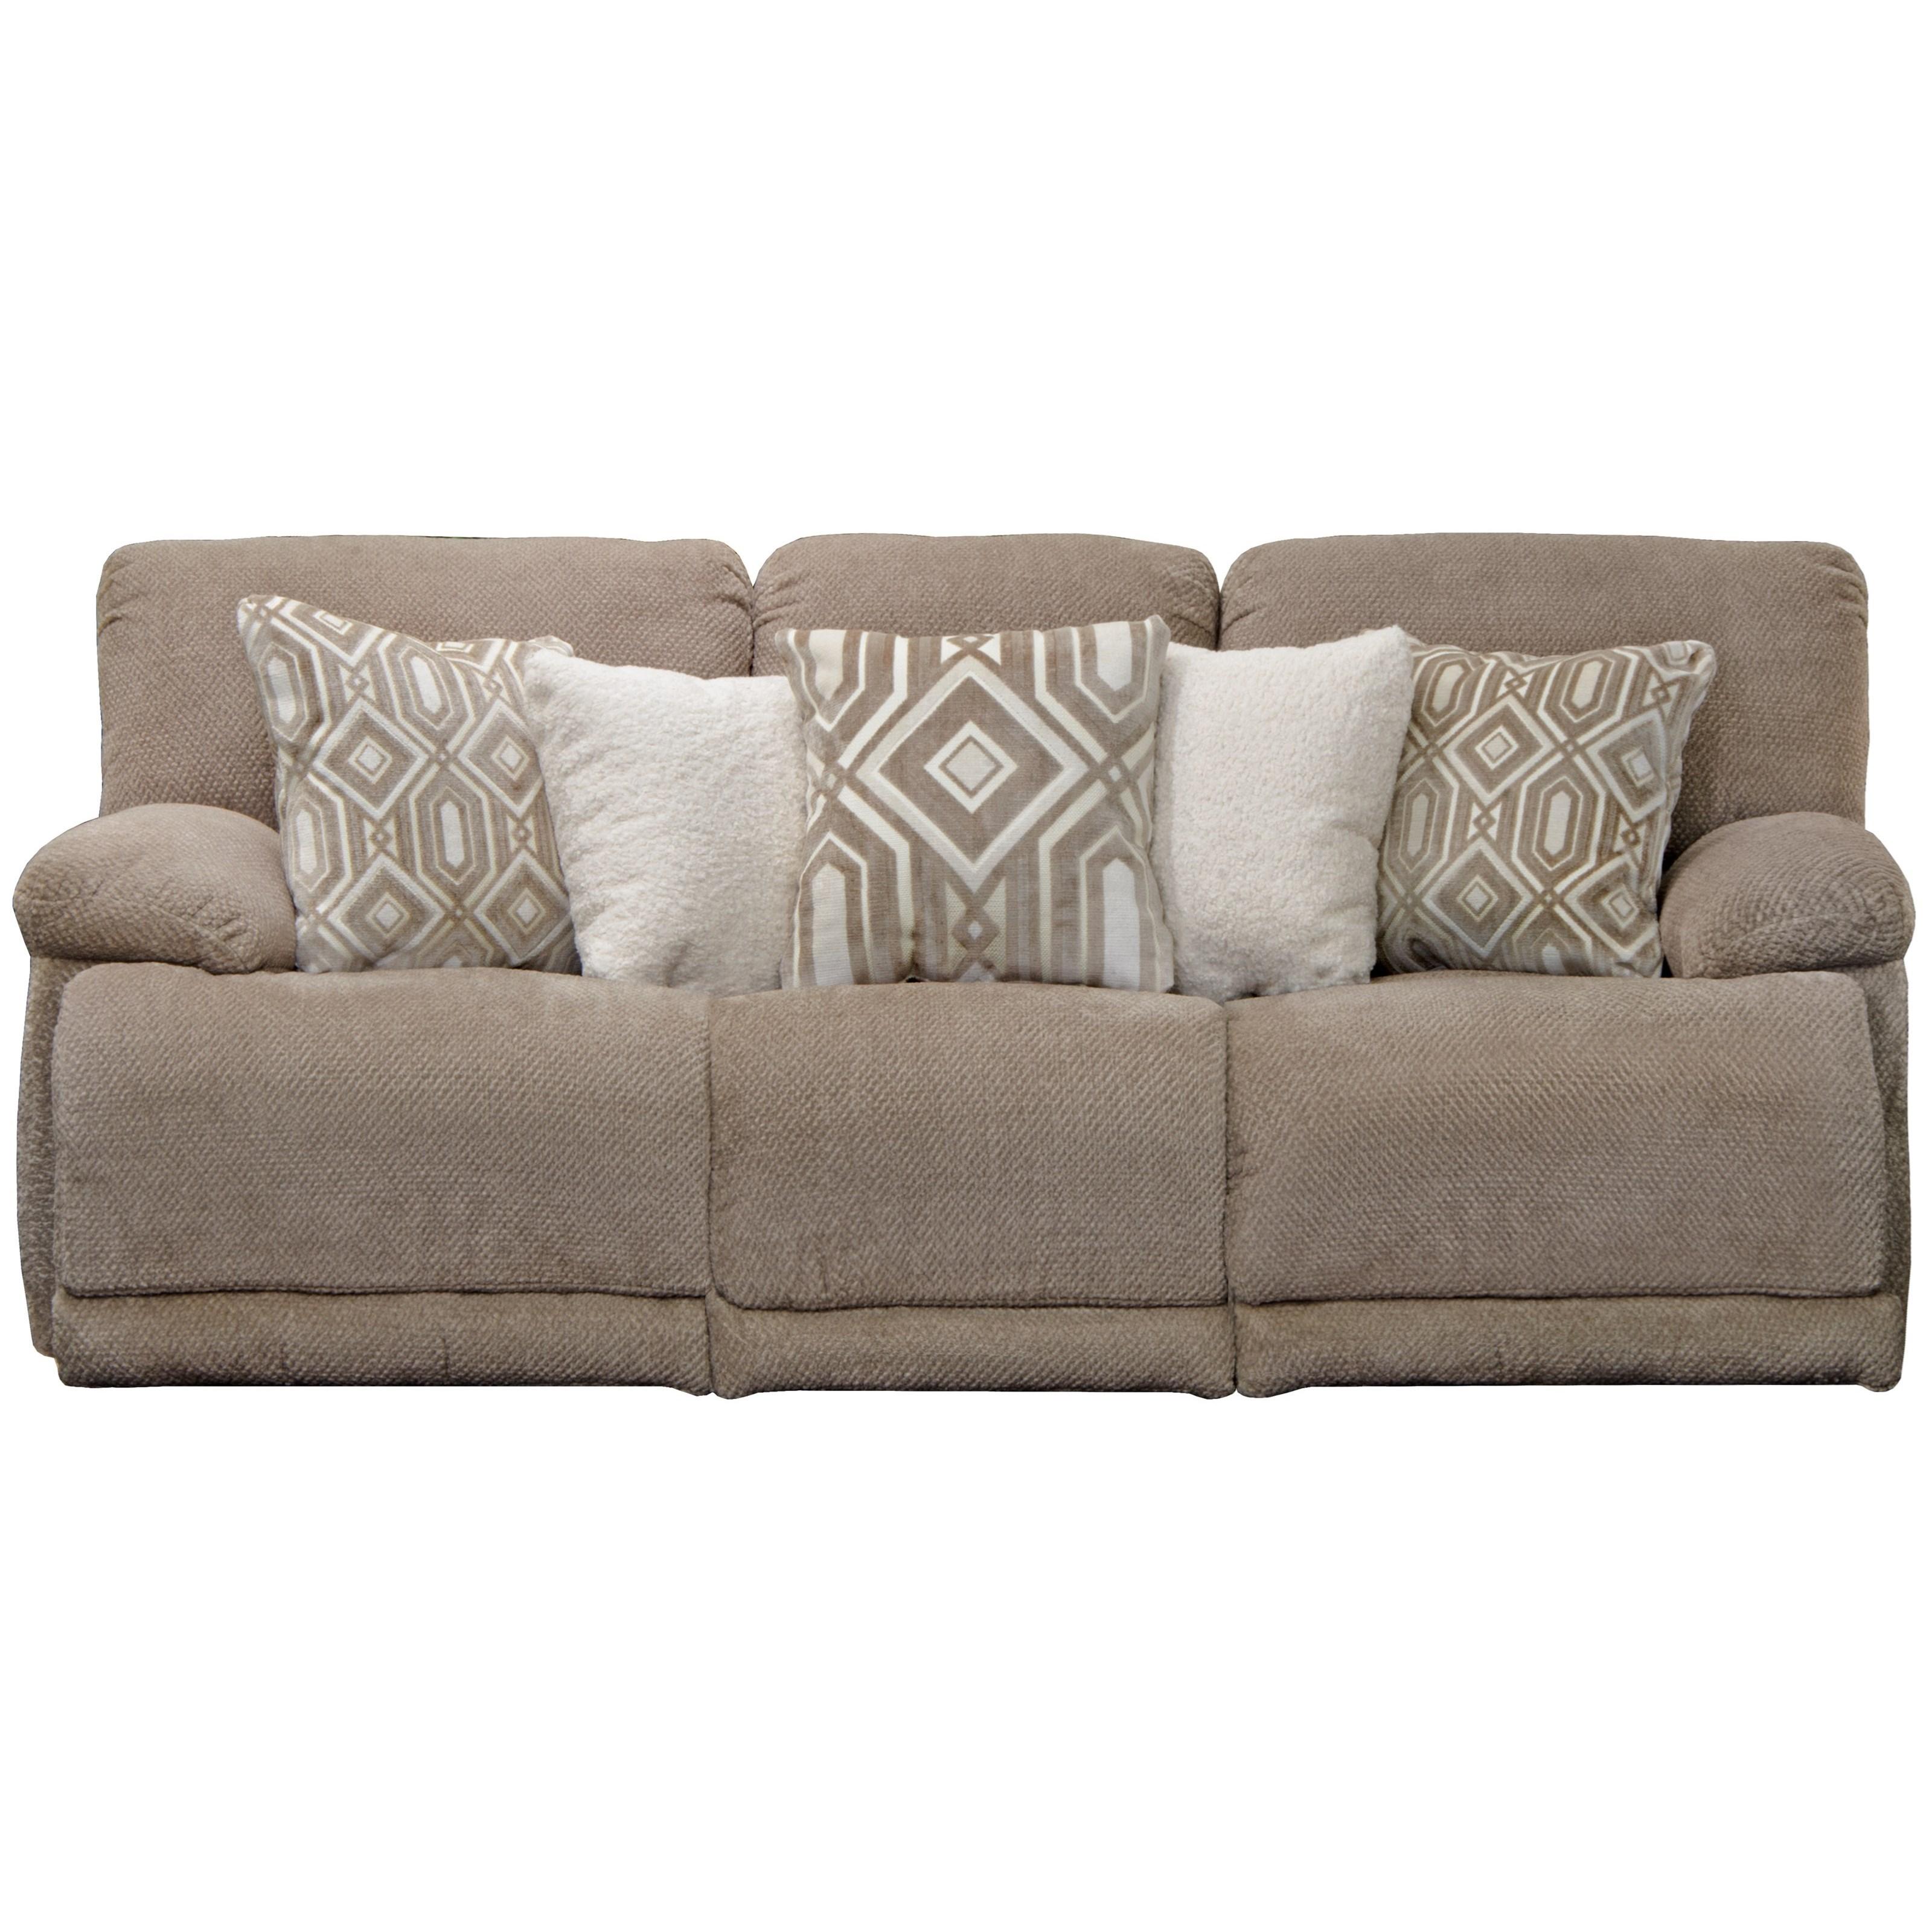 Catnapper Montego Lay Flat Reclining Sofa | Lindy\'s Furniture ...